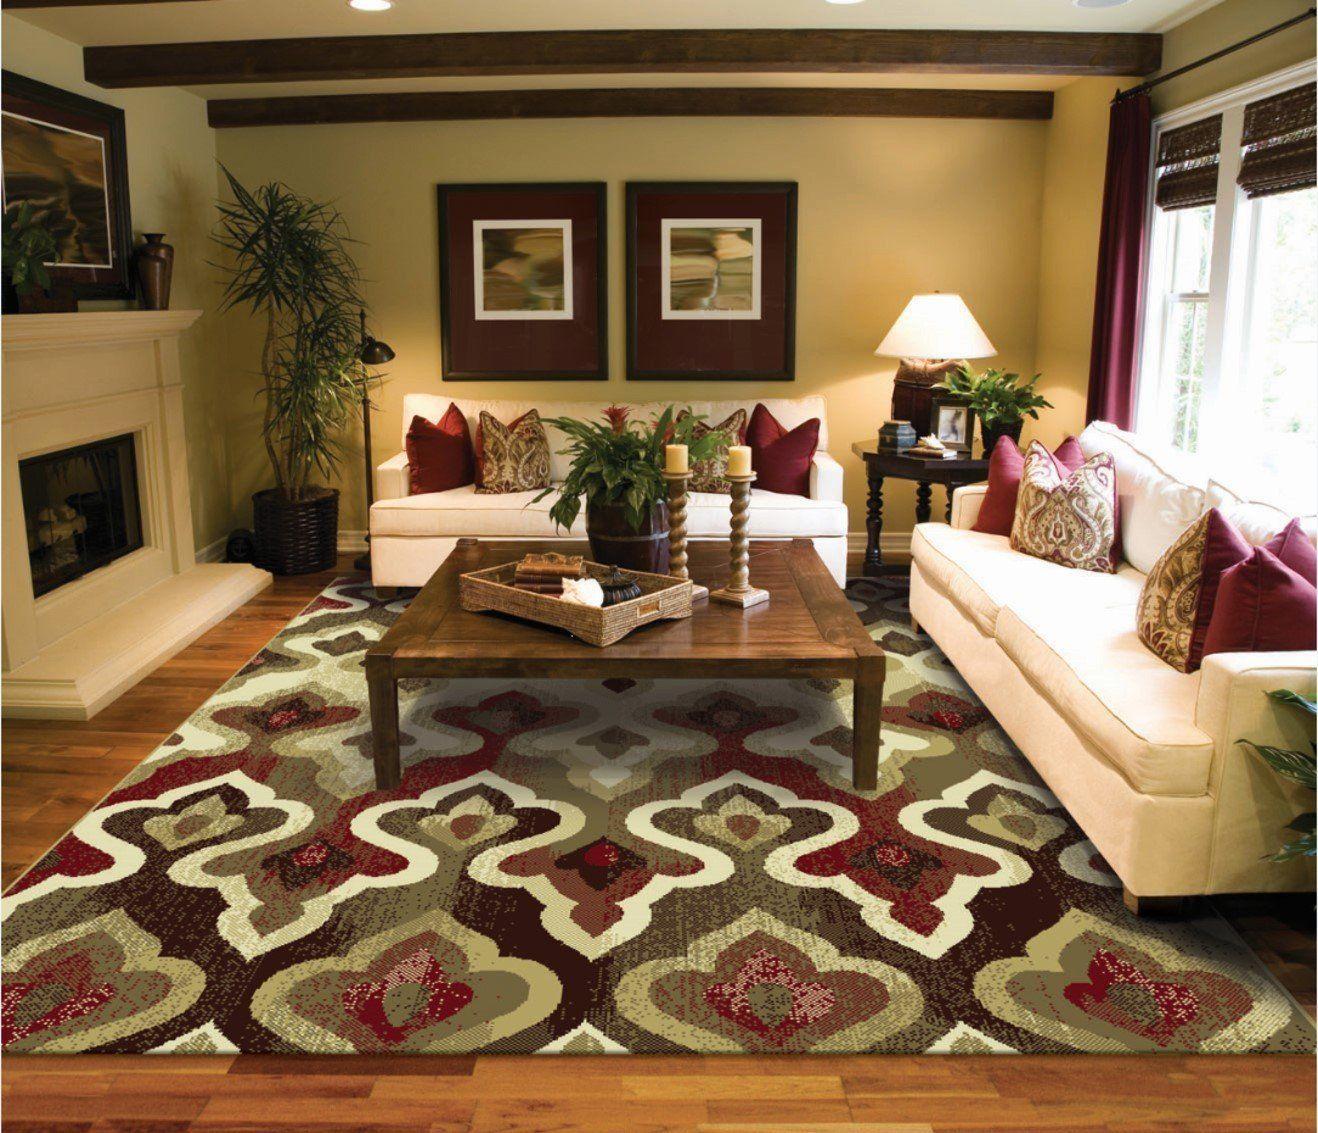 New Large 8x11 Modern Rug For Living Room Beige Cream Green Burgundy Rug 8x10 Rugs